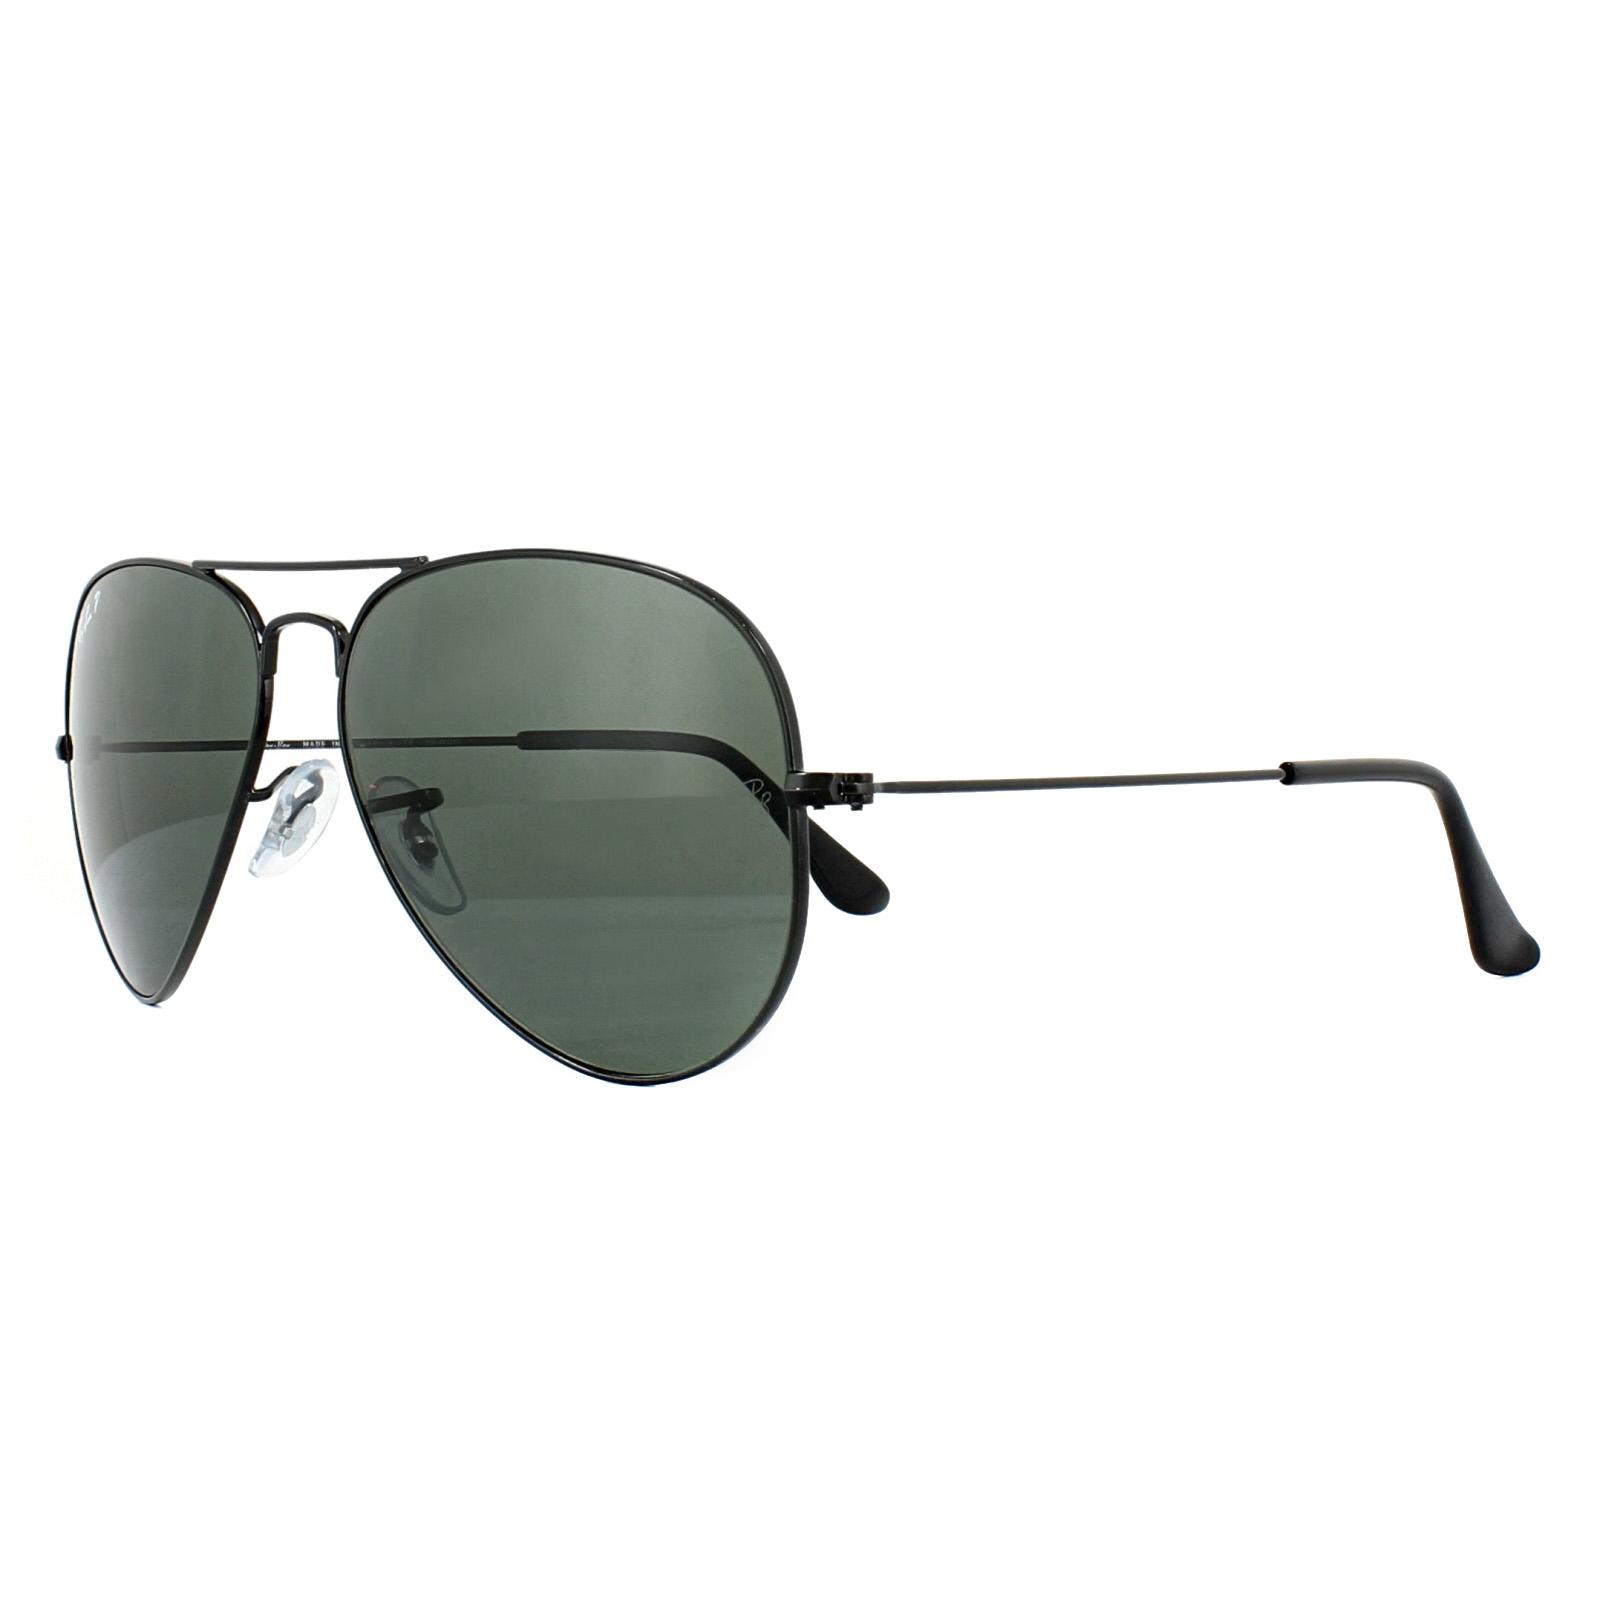 51d765f1ee Sentinel Ray-Ban Sunglasses Aviator 3025 002 58 Black Green Polarized Medium  58mm